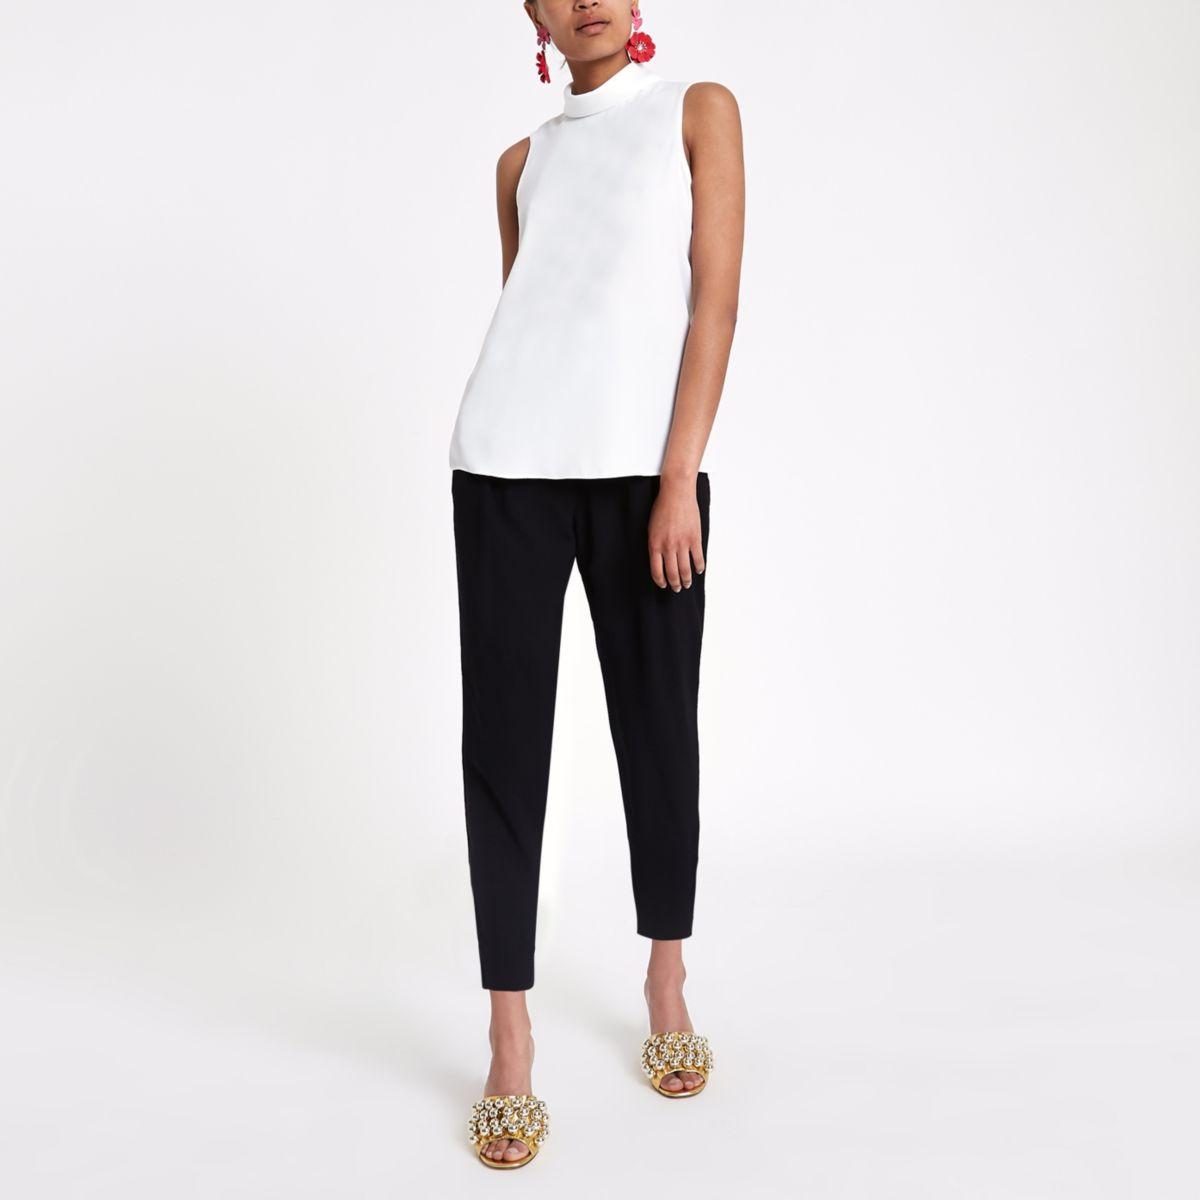 White sleeveless roll neck top